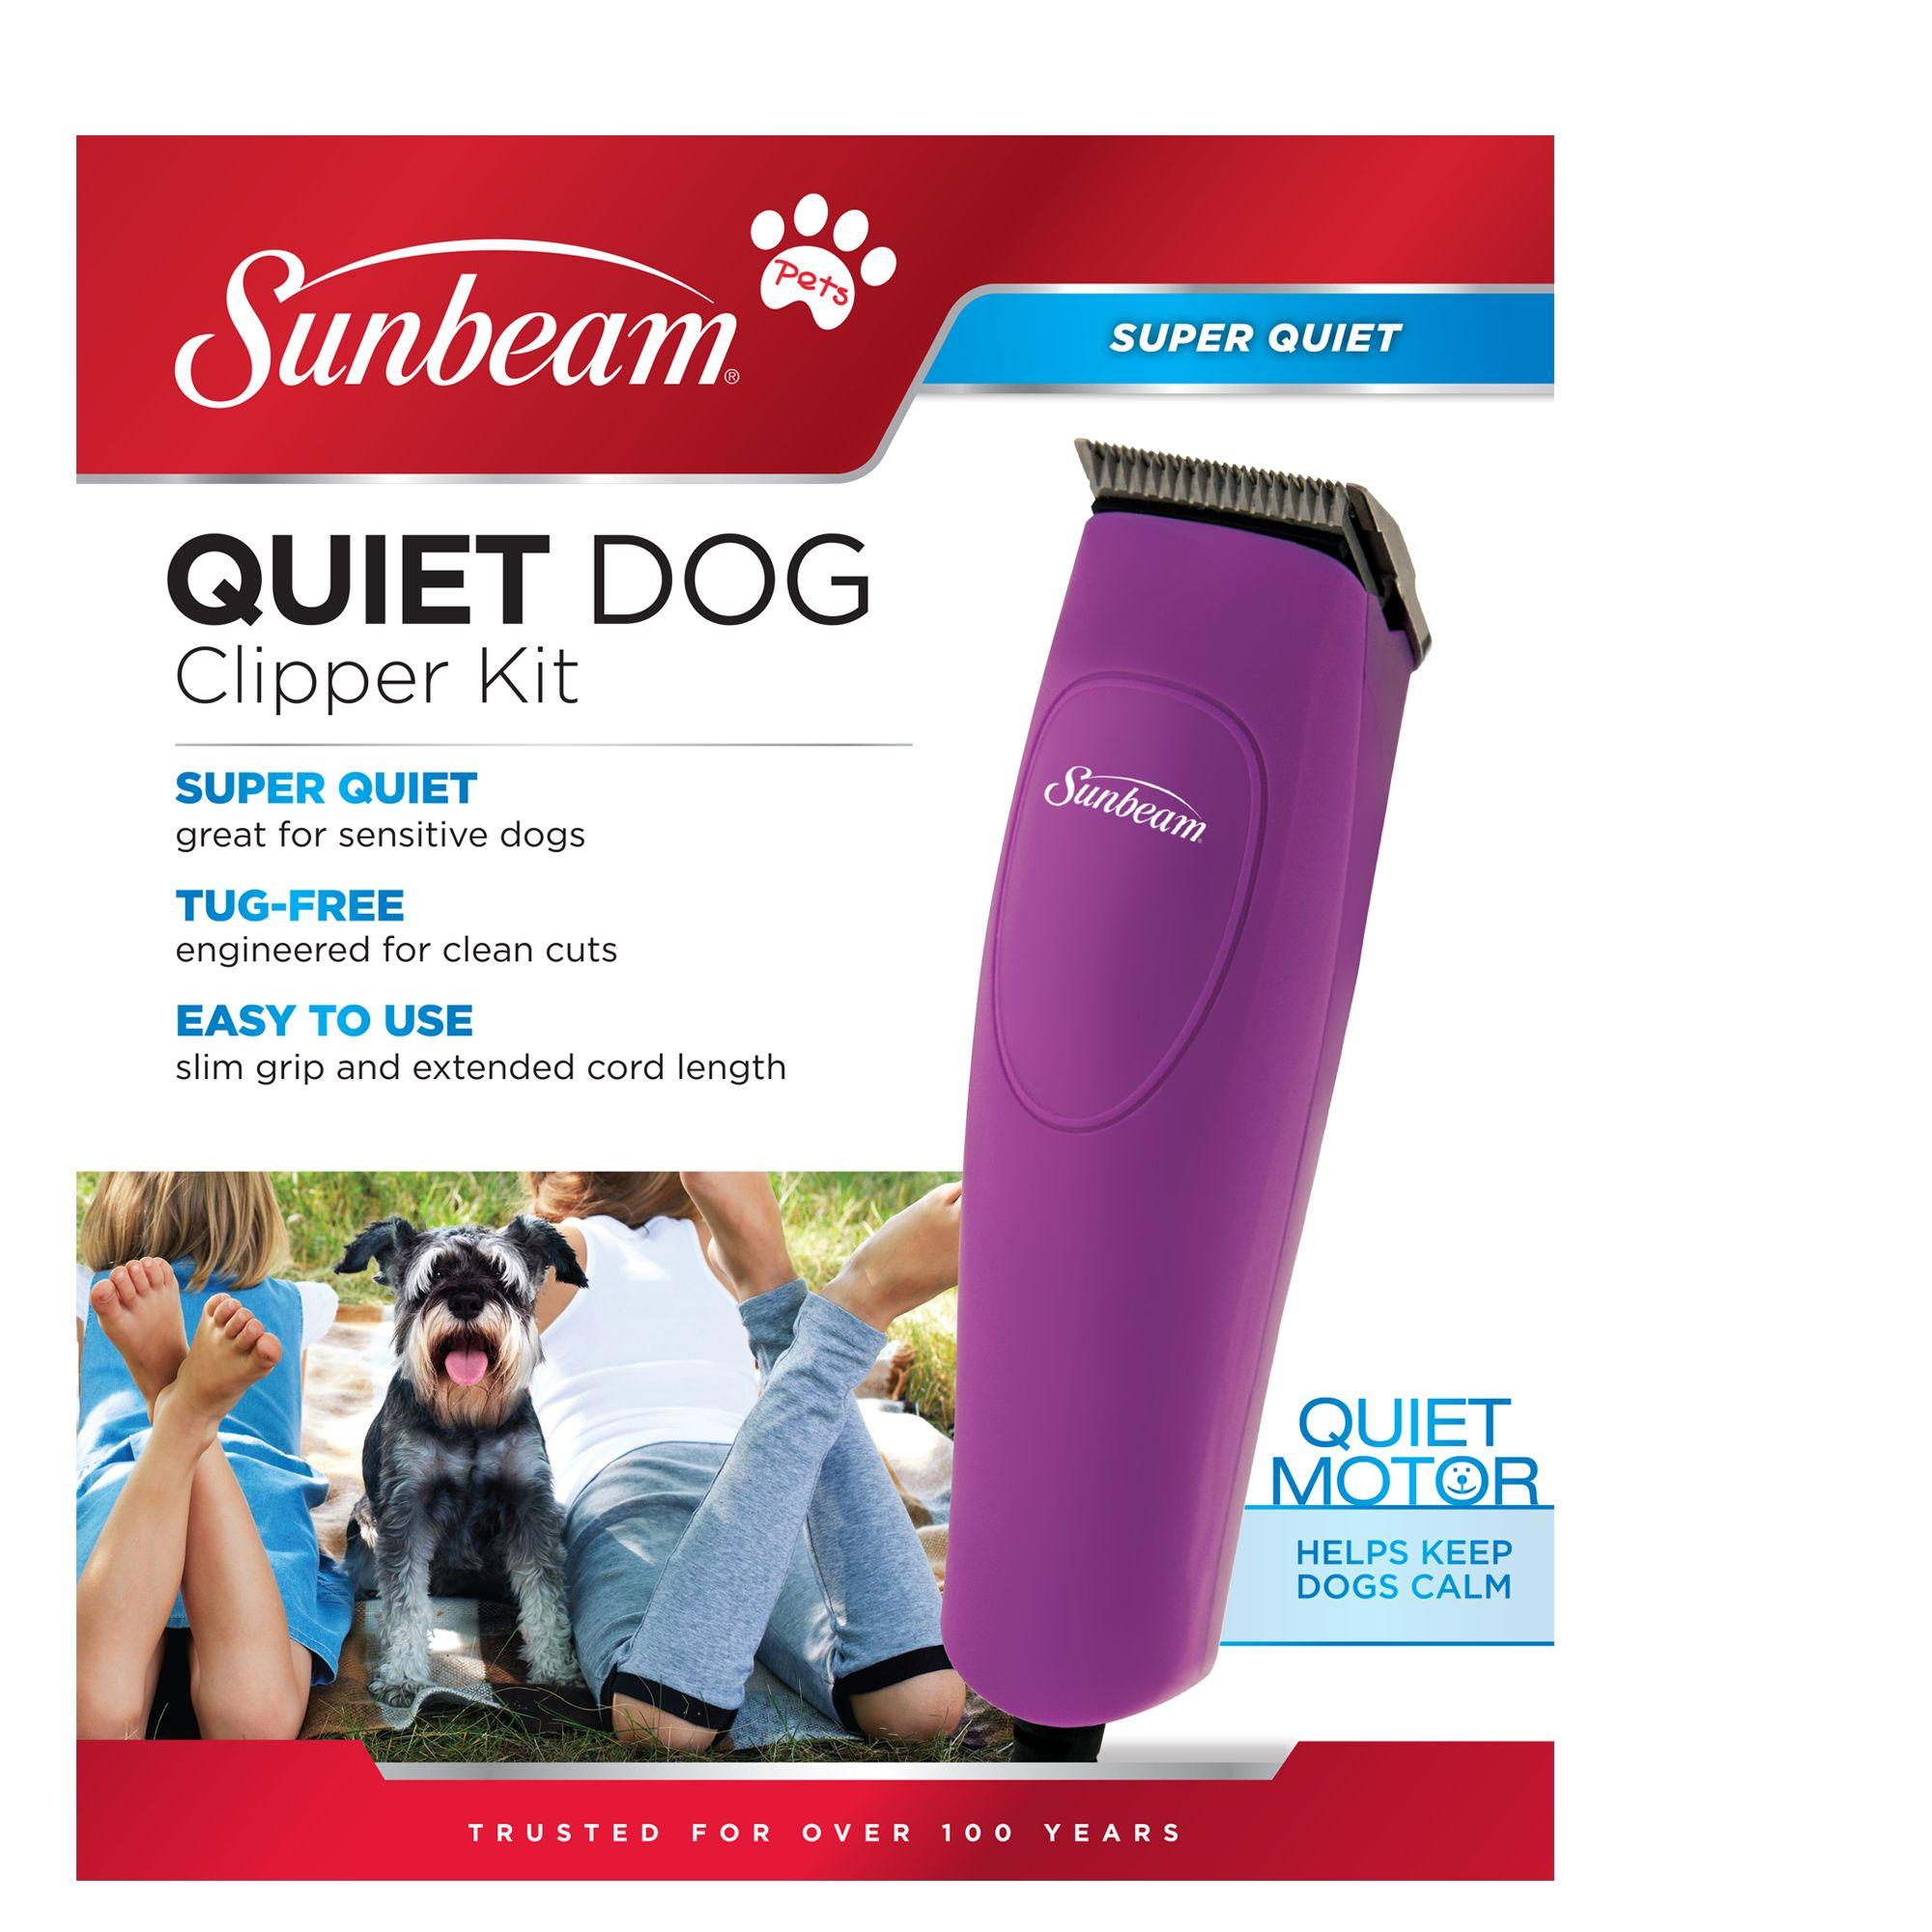 sunbeam quiet dog clipper kit